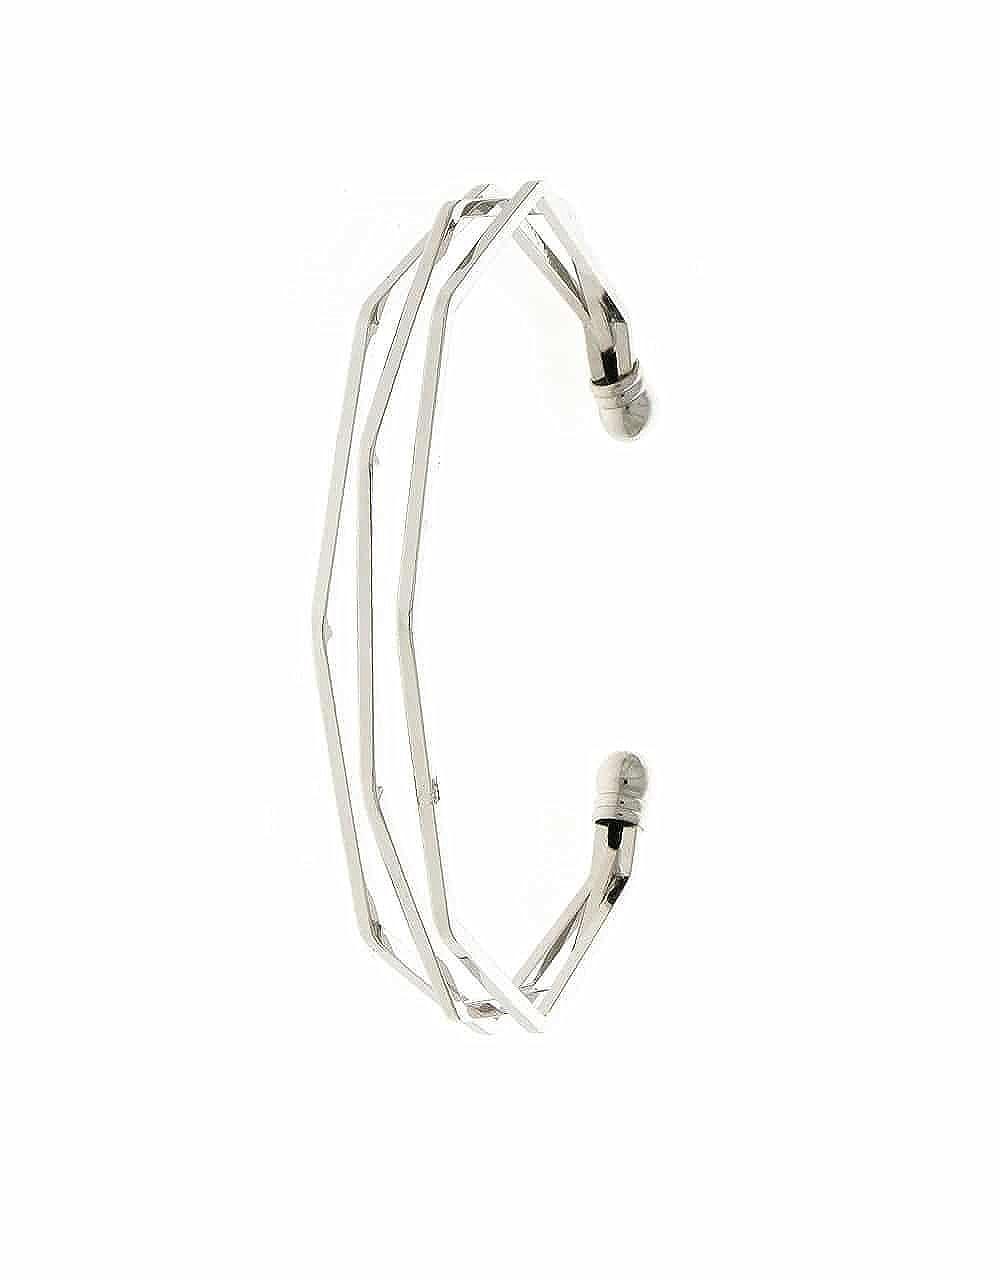 Anuradha Art Silver Finish Designer Styled with Delicate White Beads Adjustable Kada Hand Bracelets for Women//Girls